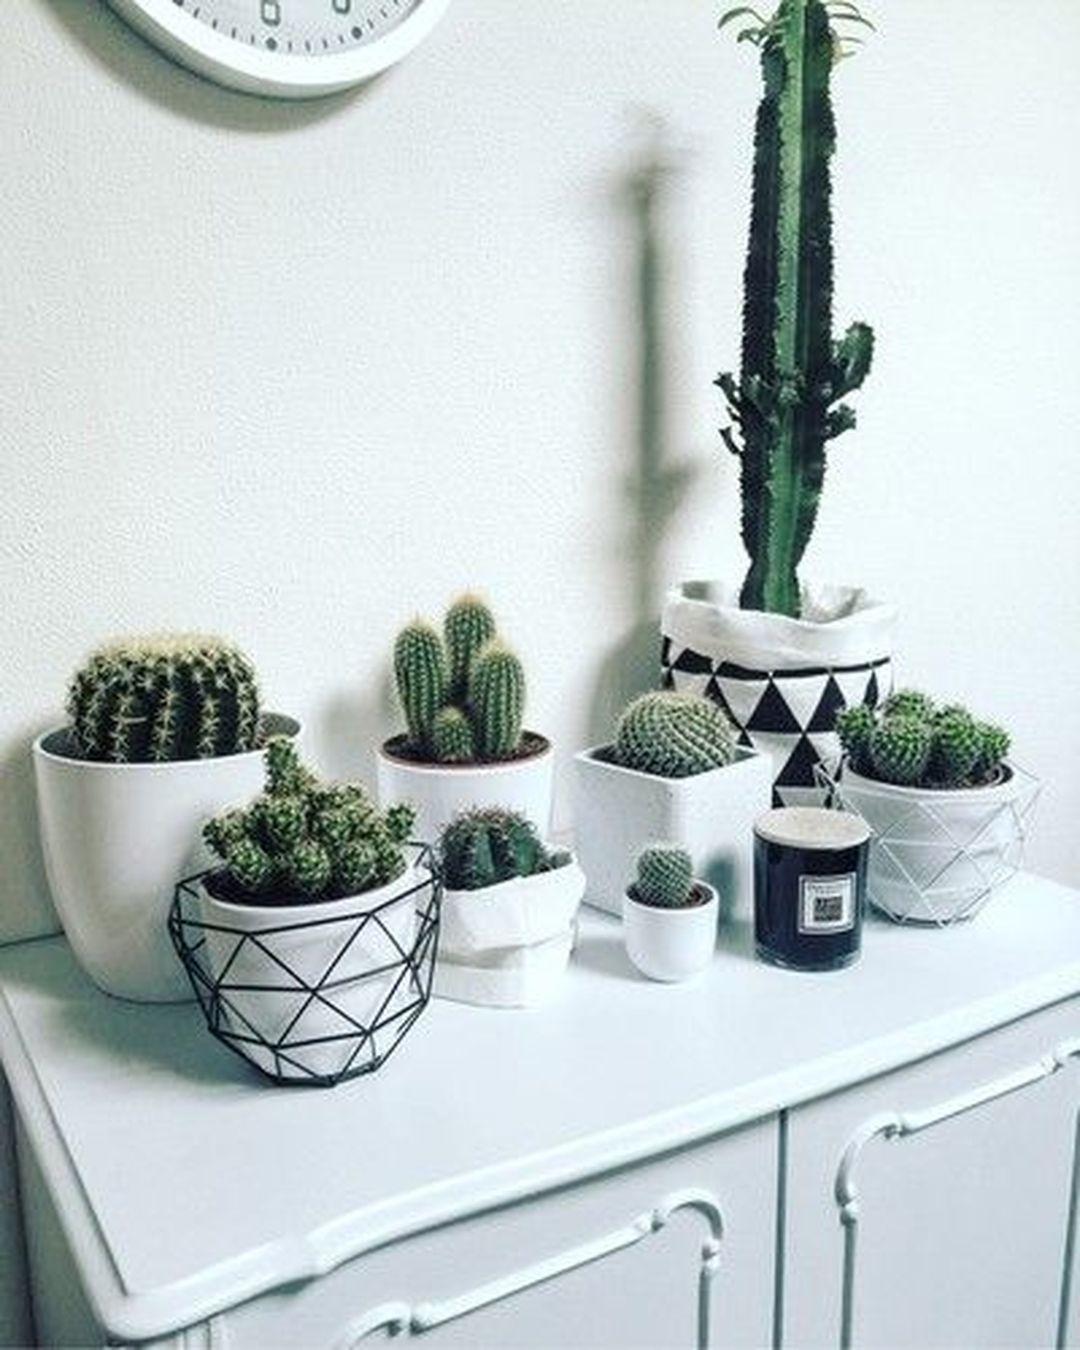 Creative and Beautiful Cactus Room Decor – Decomagz